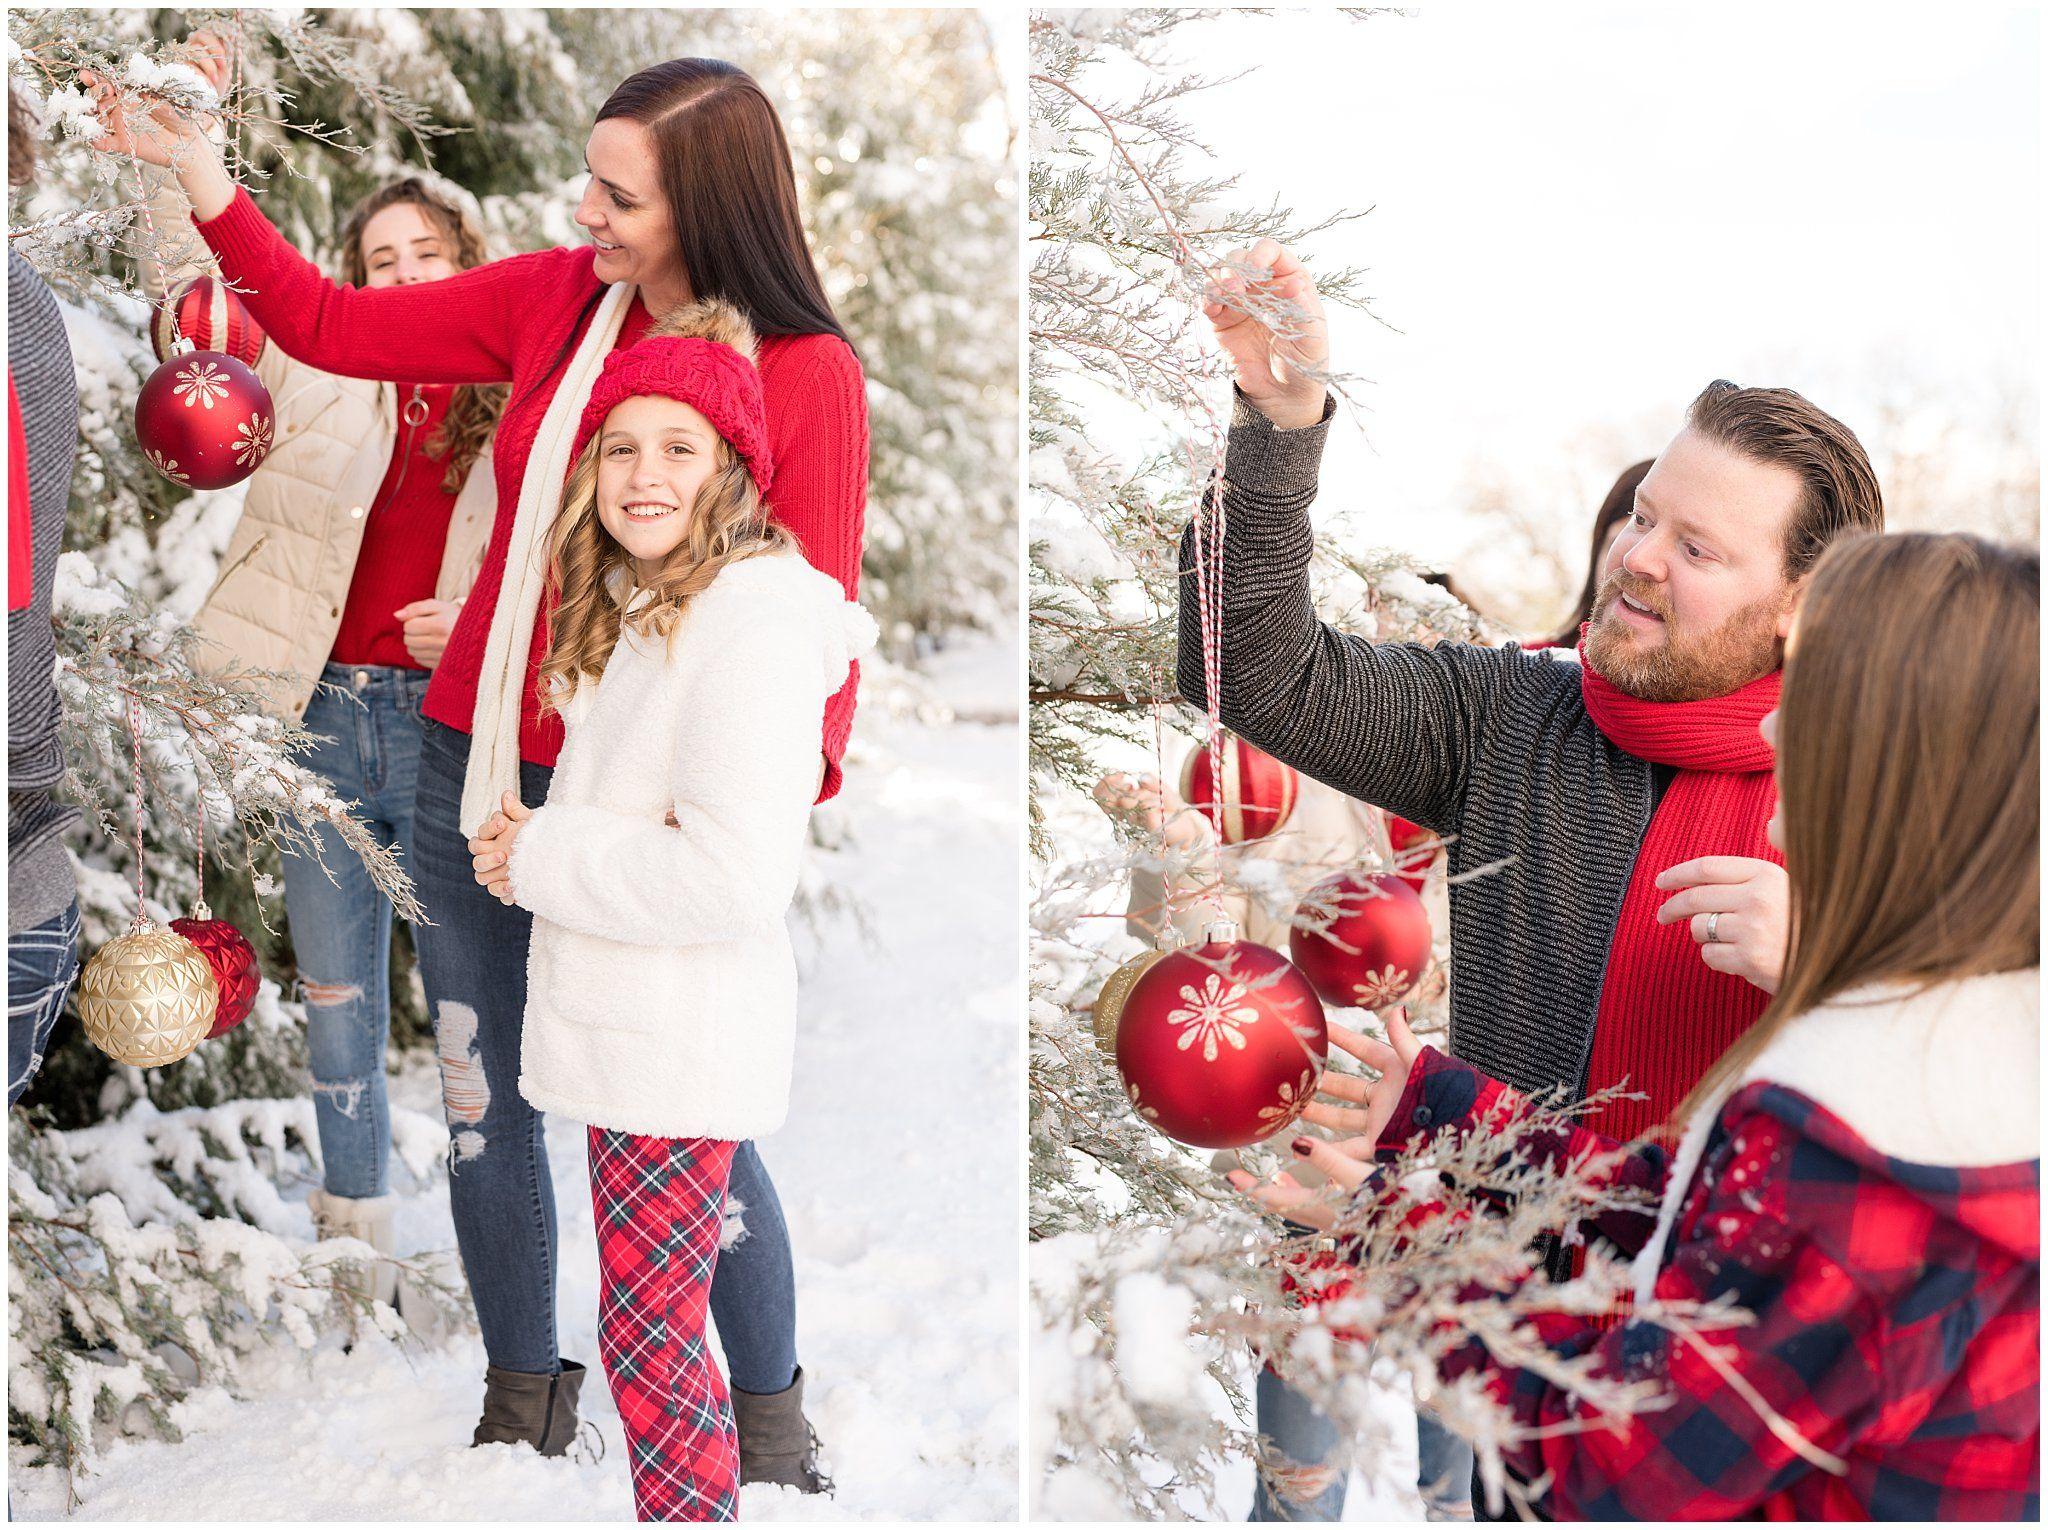 Jessie Christmas.Utah Family Christmas Photoshoot Family Session